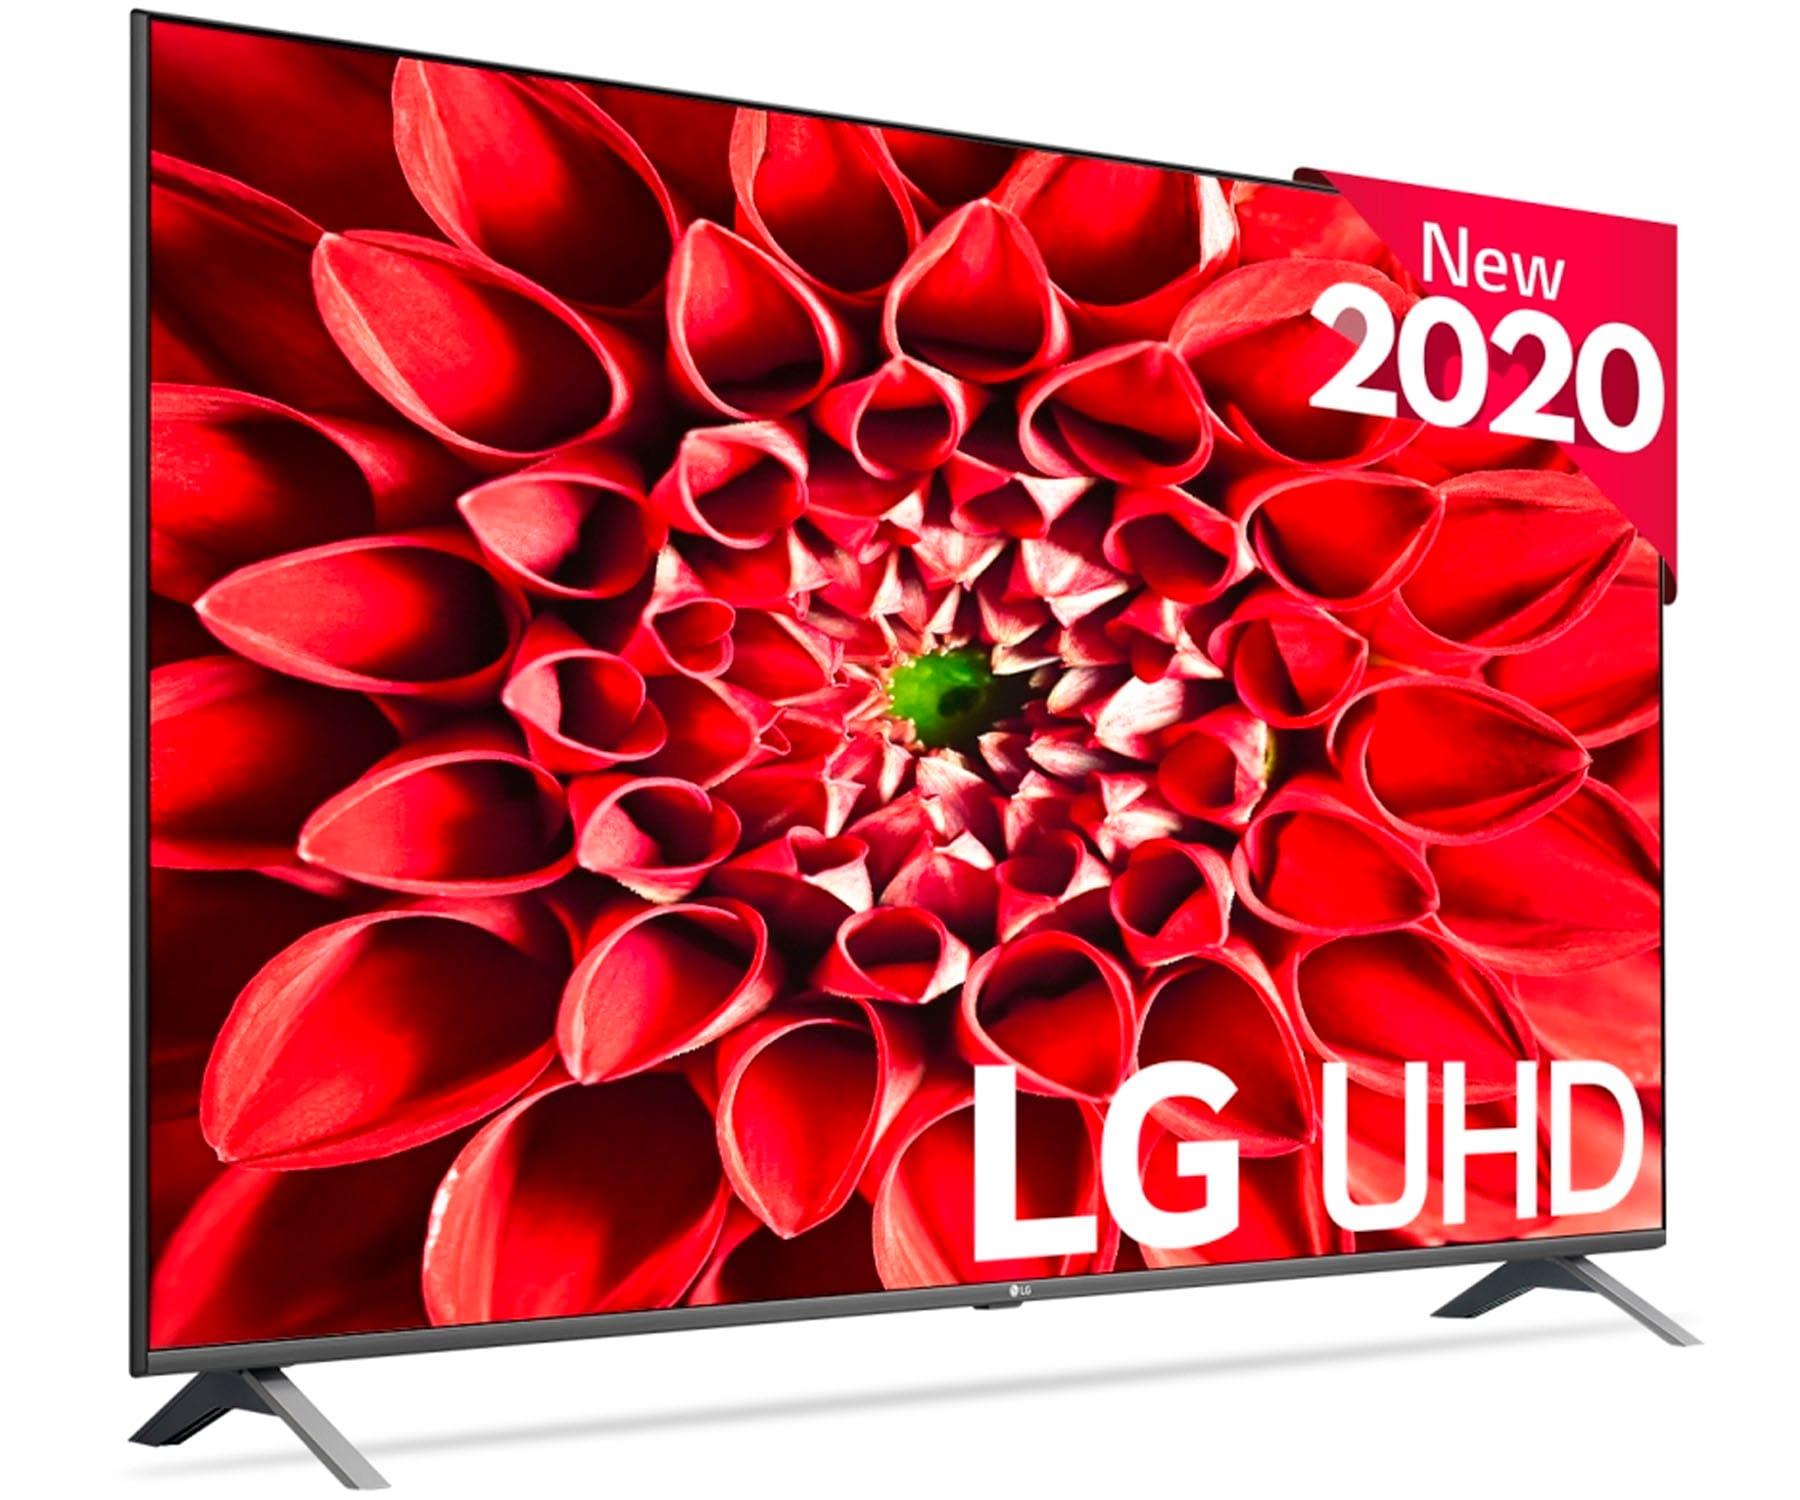 LG 65UN8006LA TELEVISOR 65'' IPS LED UHD 4K HDR SMART TV WEBOS 5.0 WIFI BLUETOOTH HDMI USB